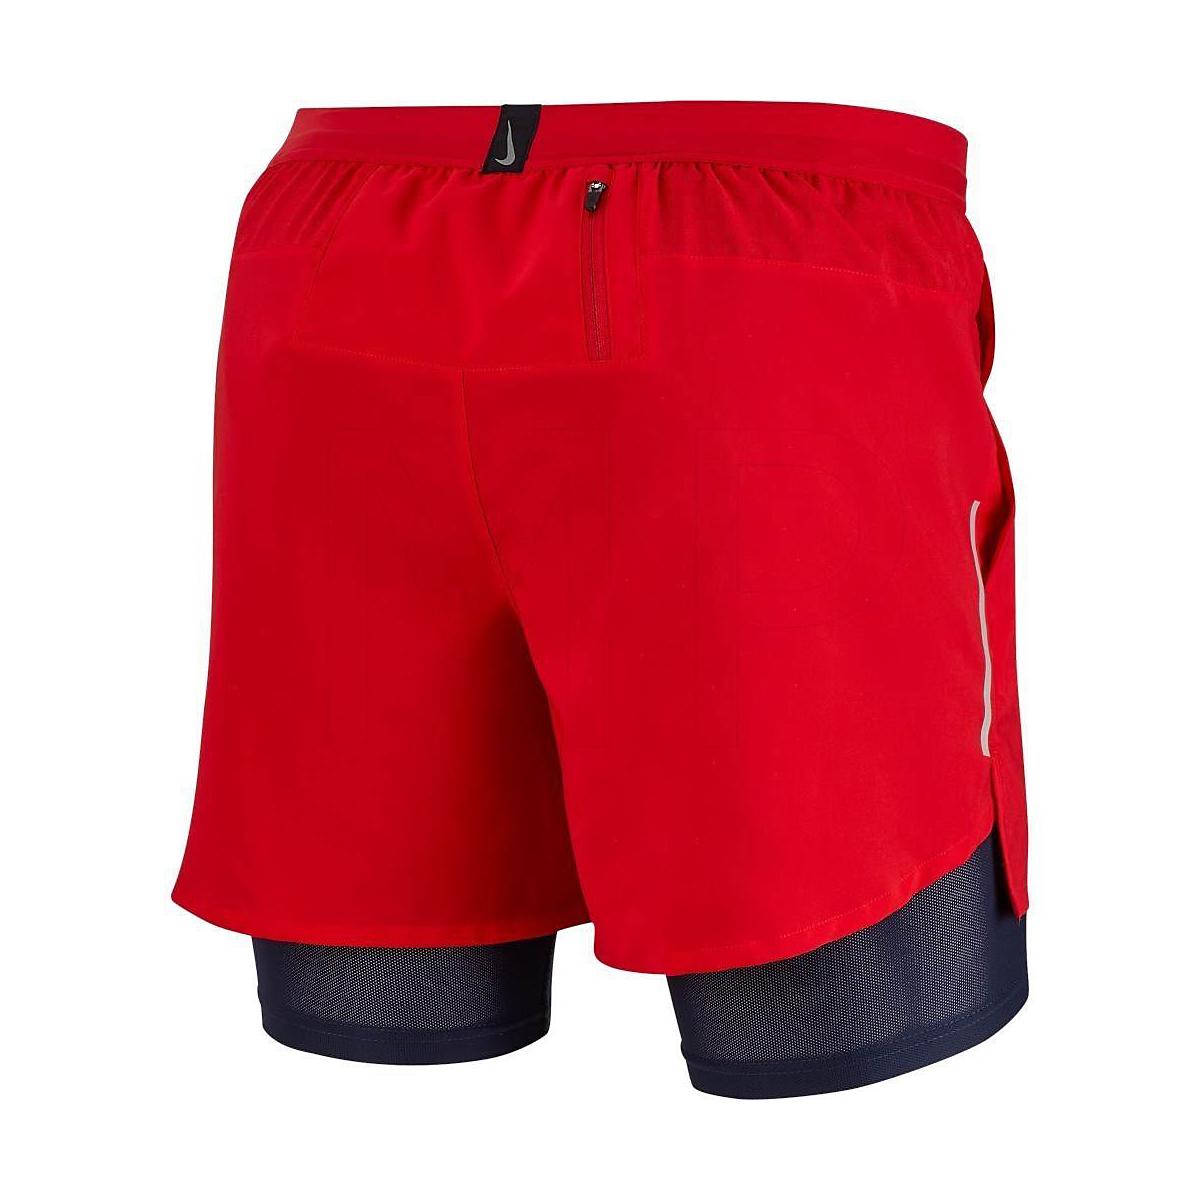 "Men's Nike Dri-FIT Flex Stride 7"" 2-in-1 Shorts - Color: University Red - Size: S, University Red, large, image 2"